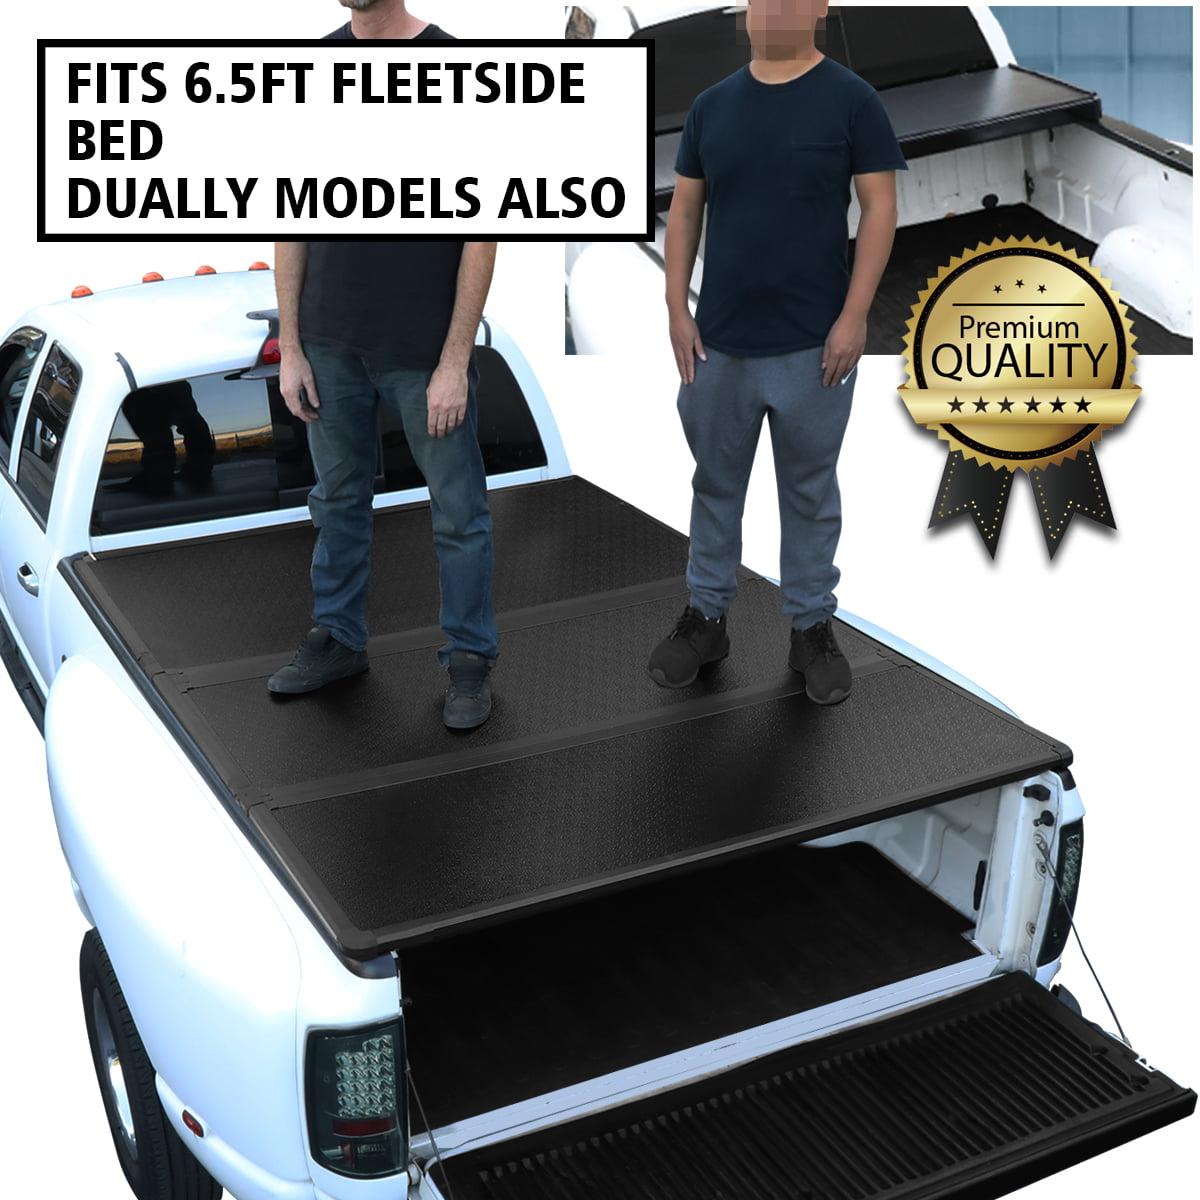 For 1999 To 2018 Ford F250 F350 F450 Super Duty Fleetside 6 5ft Short Bed Hard Solid Tri Fold Tonneau Cover Walmart Com Walmart Com